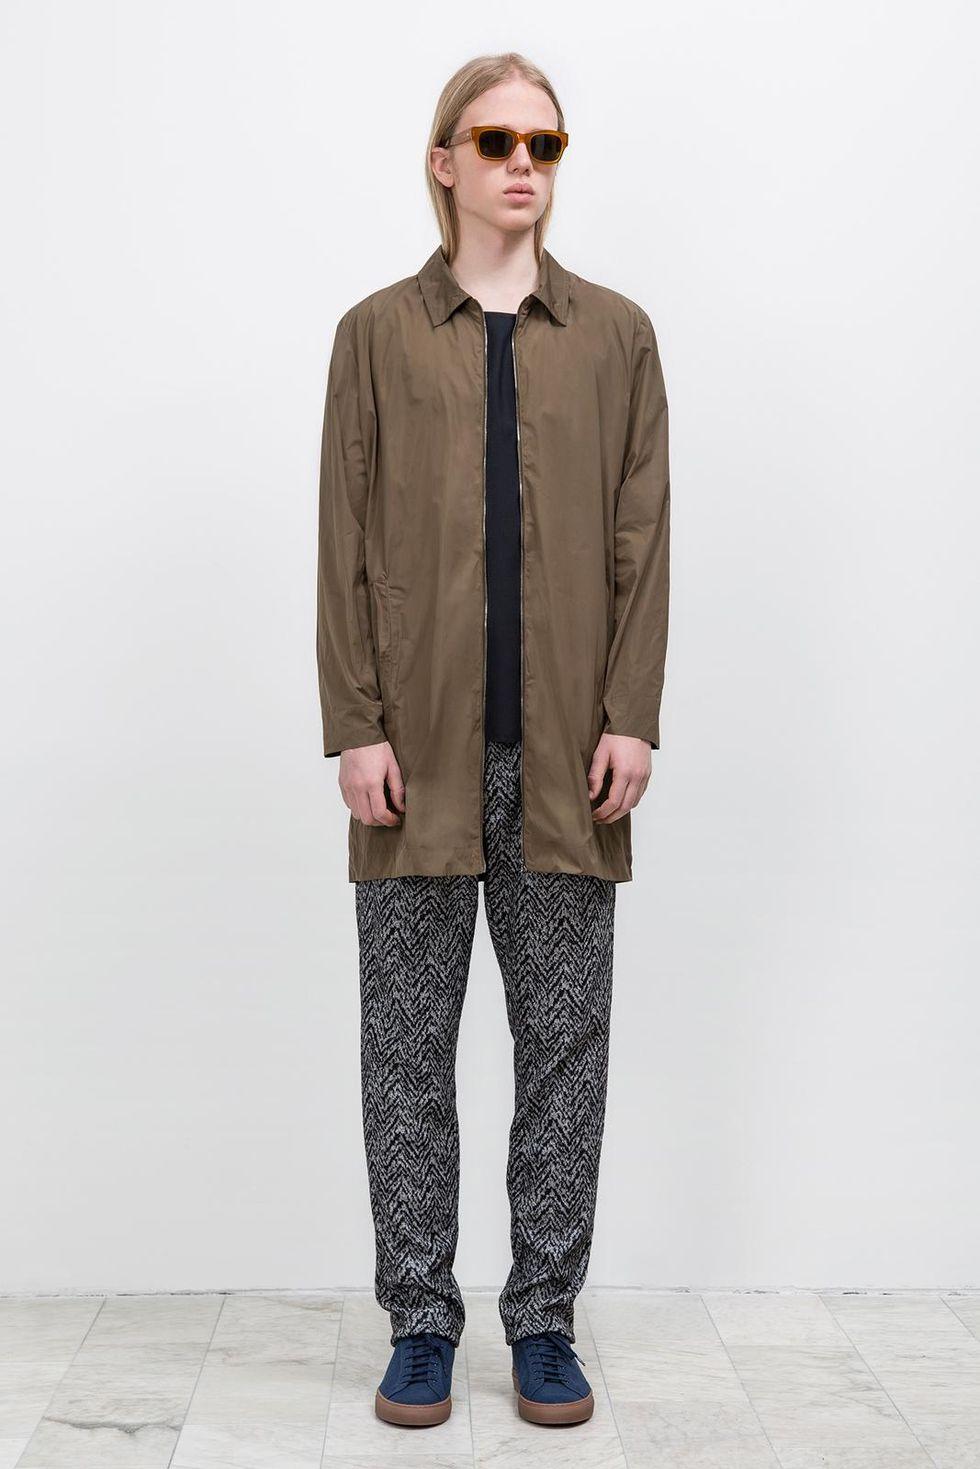 tres-bien-menswear-collection-spring-summer-2015-05.jpg